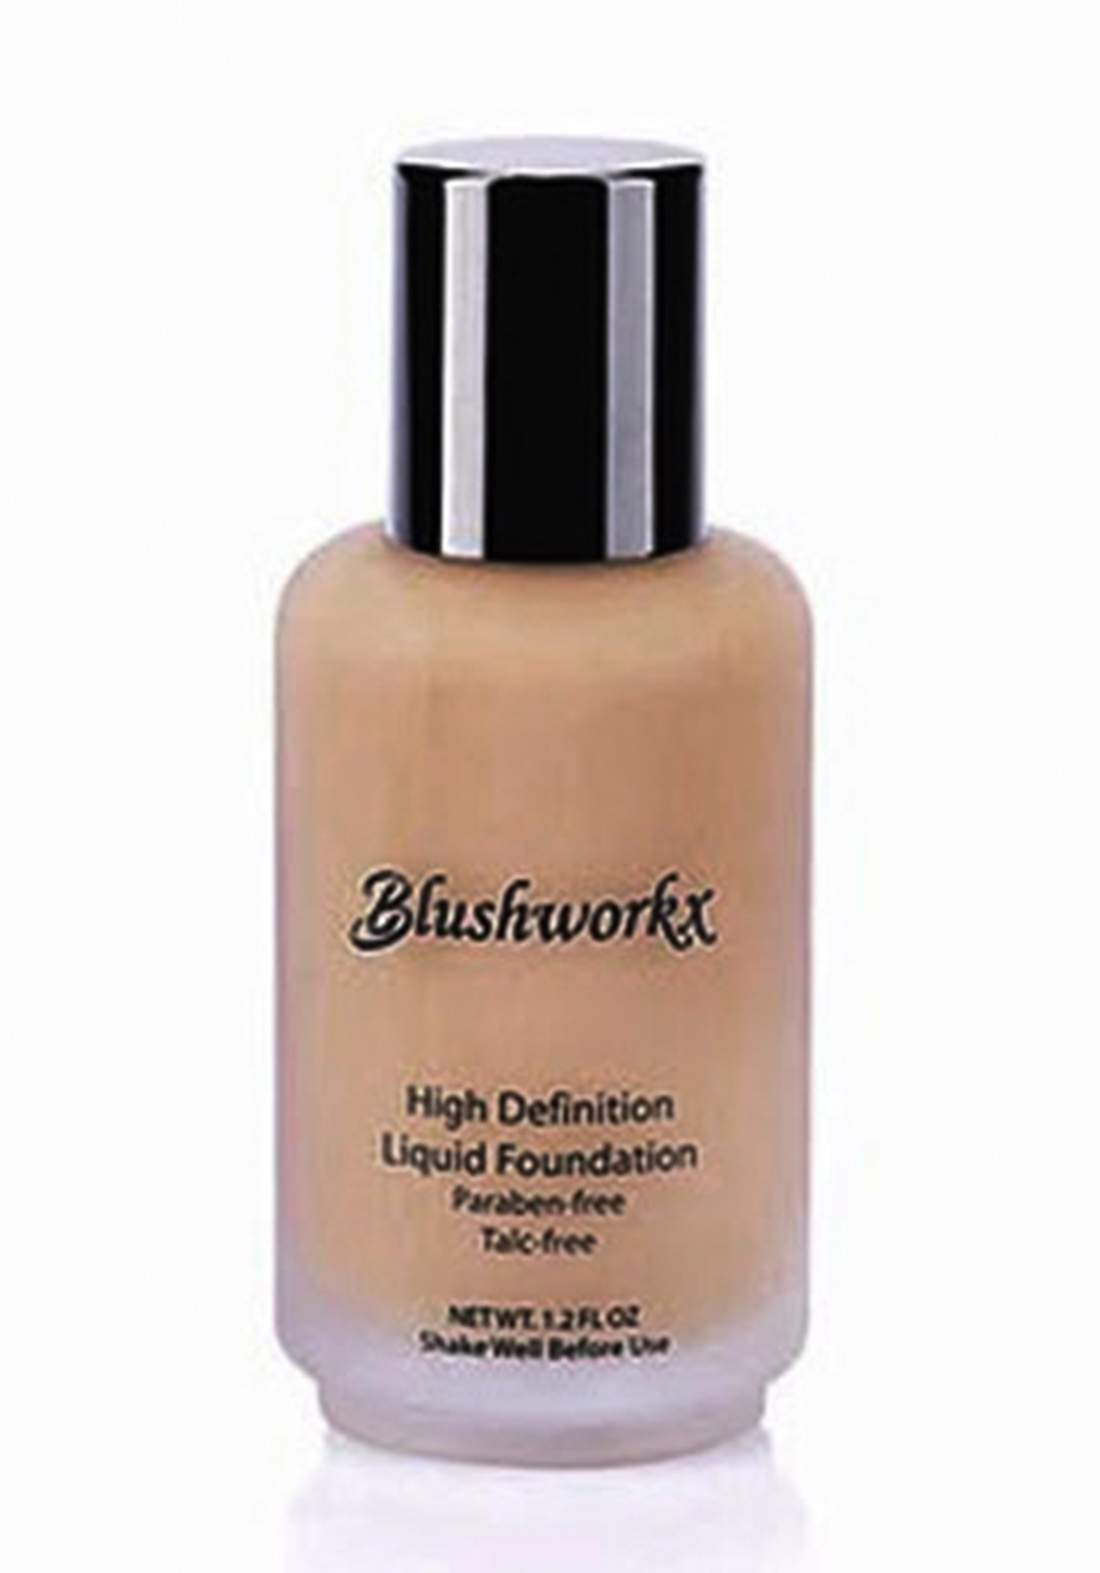 Blushworkx Hollywood High Definition Liquid Foundation 35ml Medium Light كريم اساس